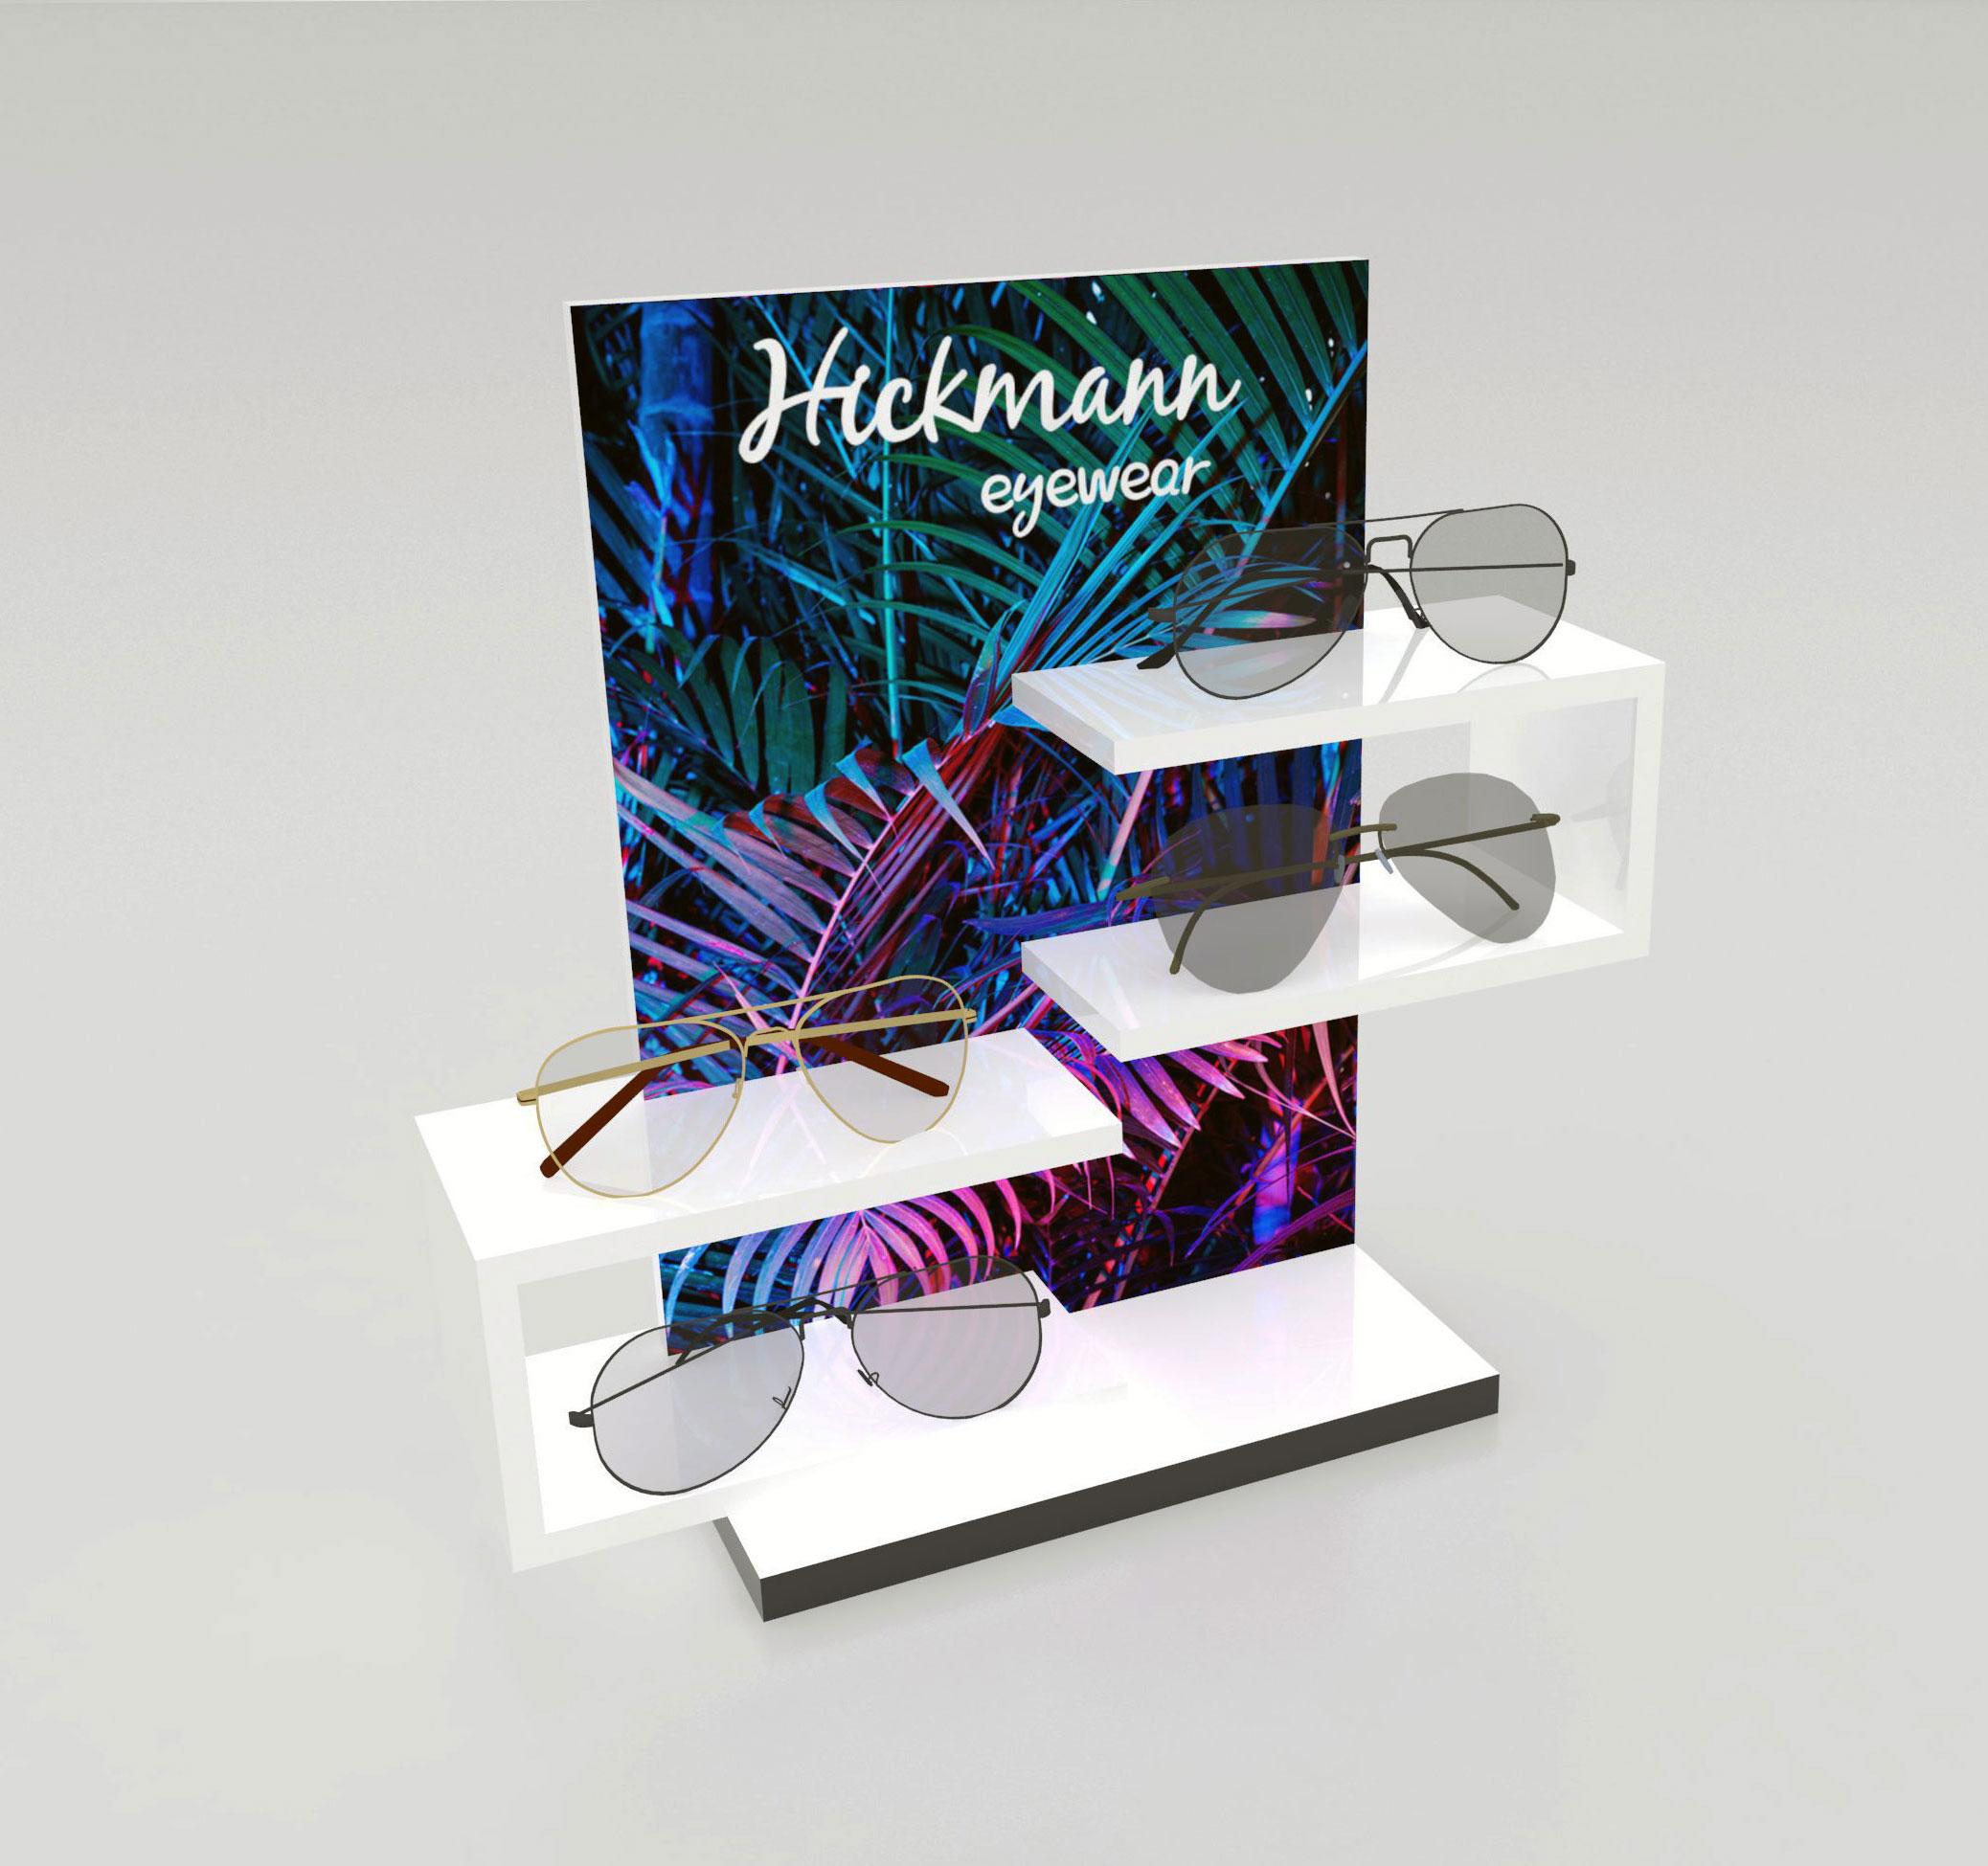 Hickmann-1